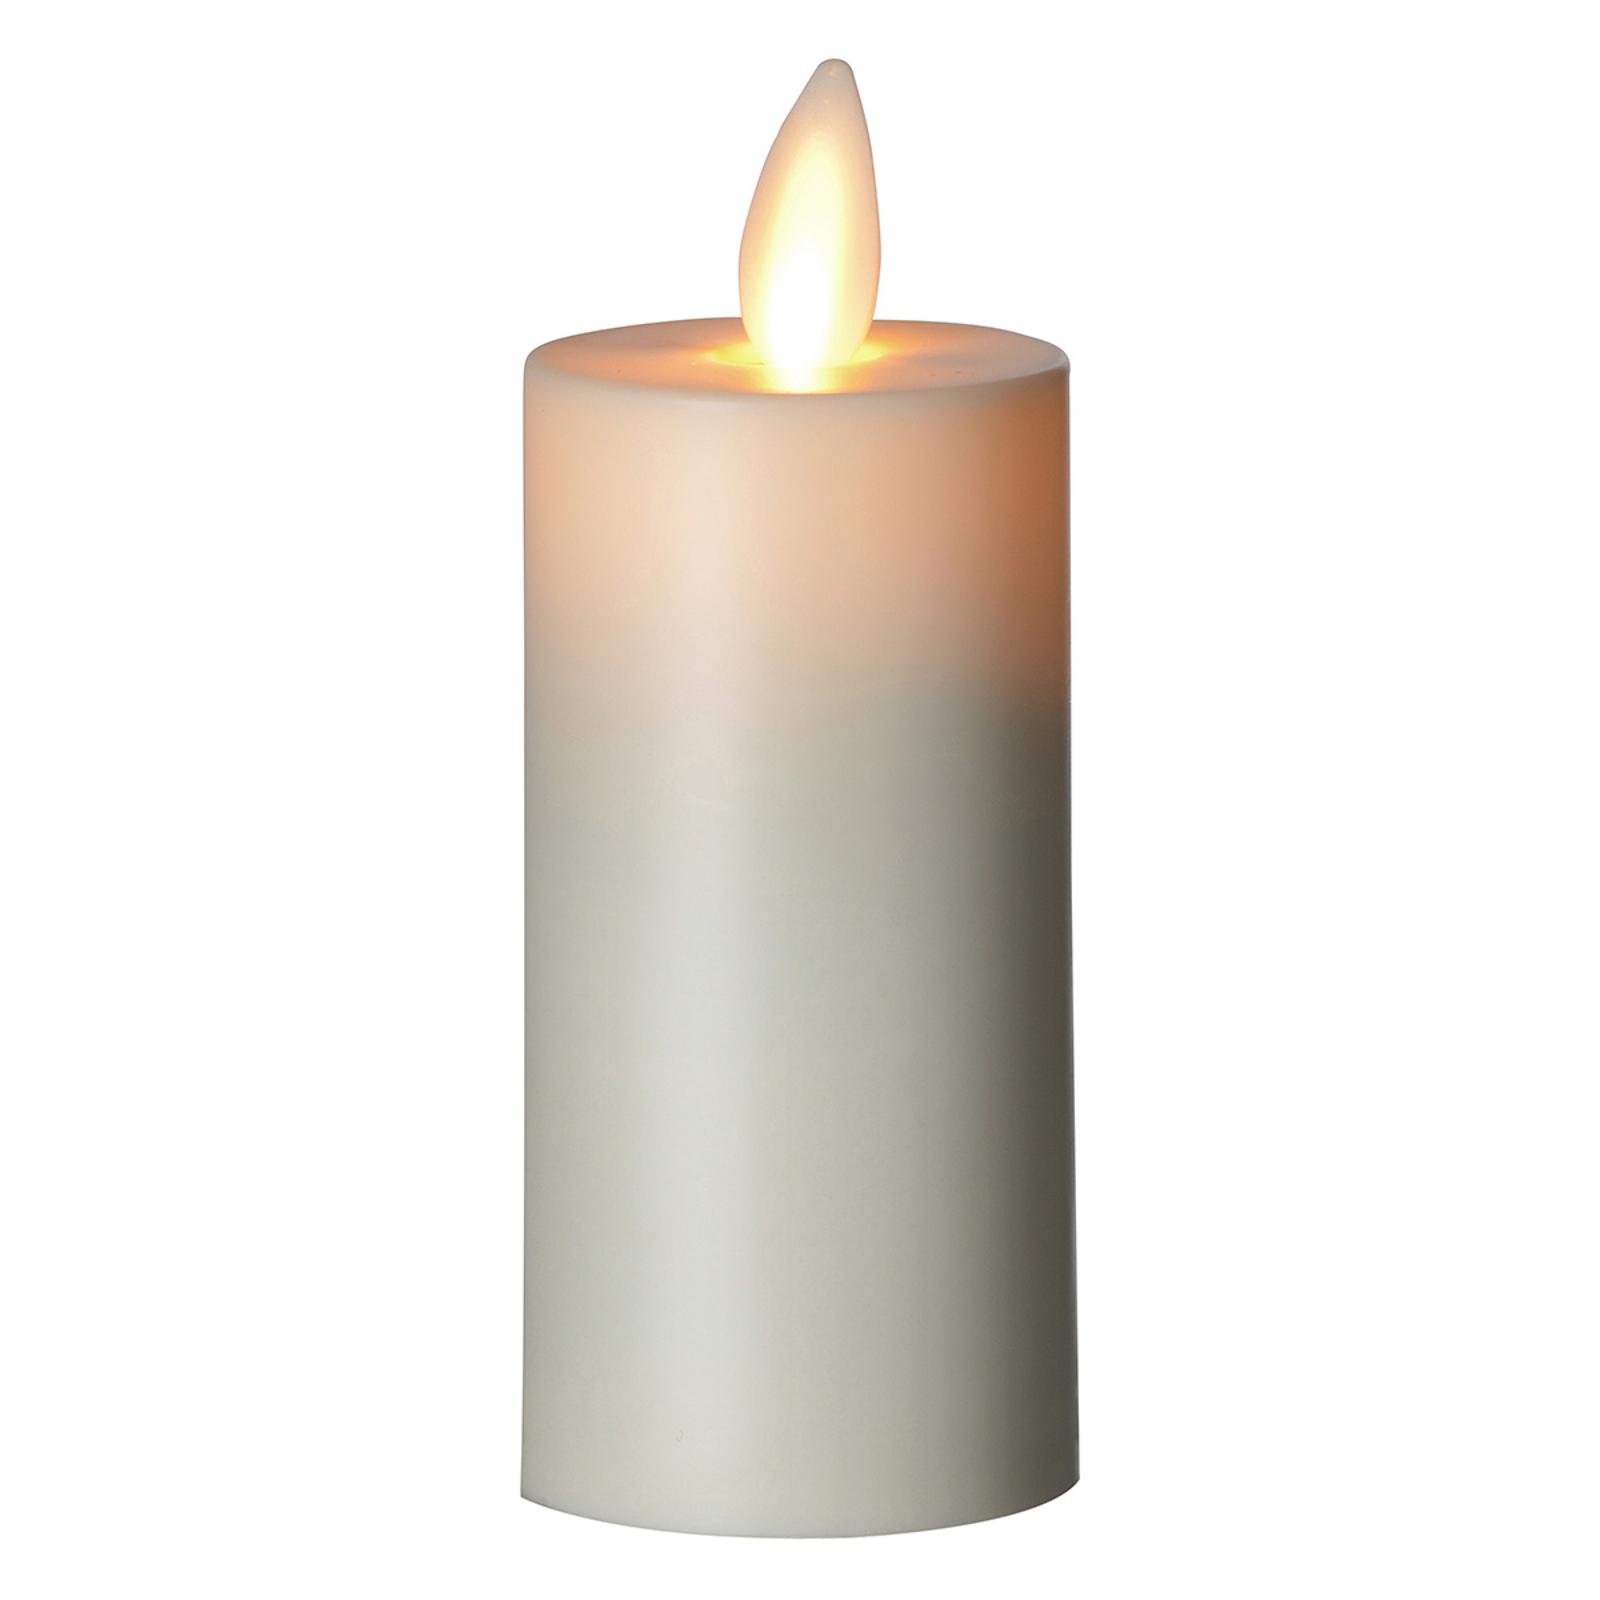 Bougie LED Flame bougie chauffe-plat XL 8,3cm